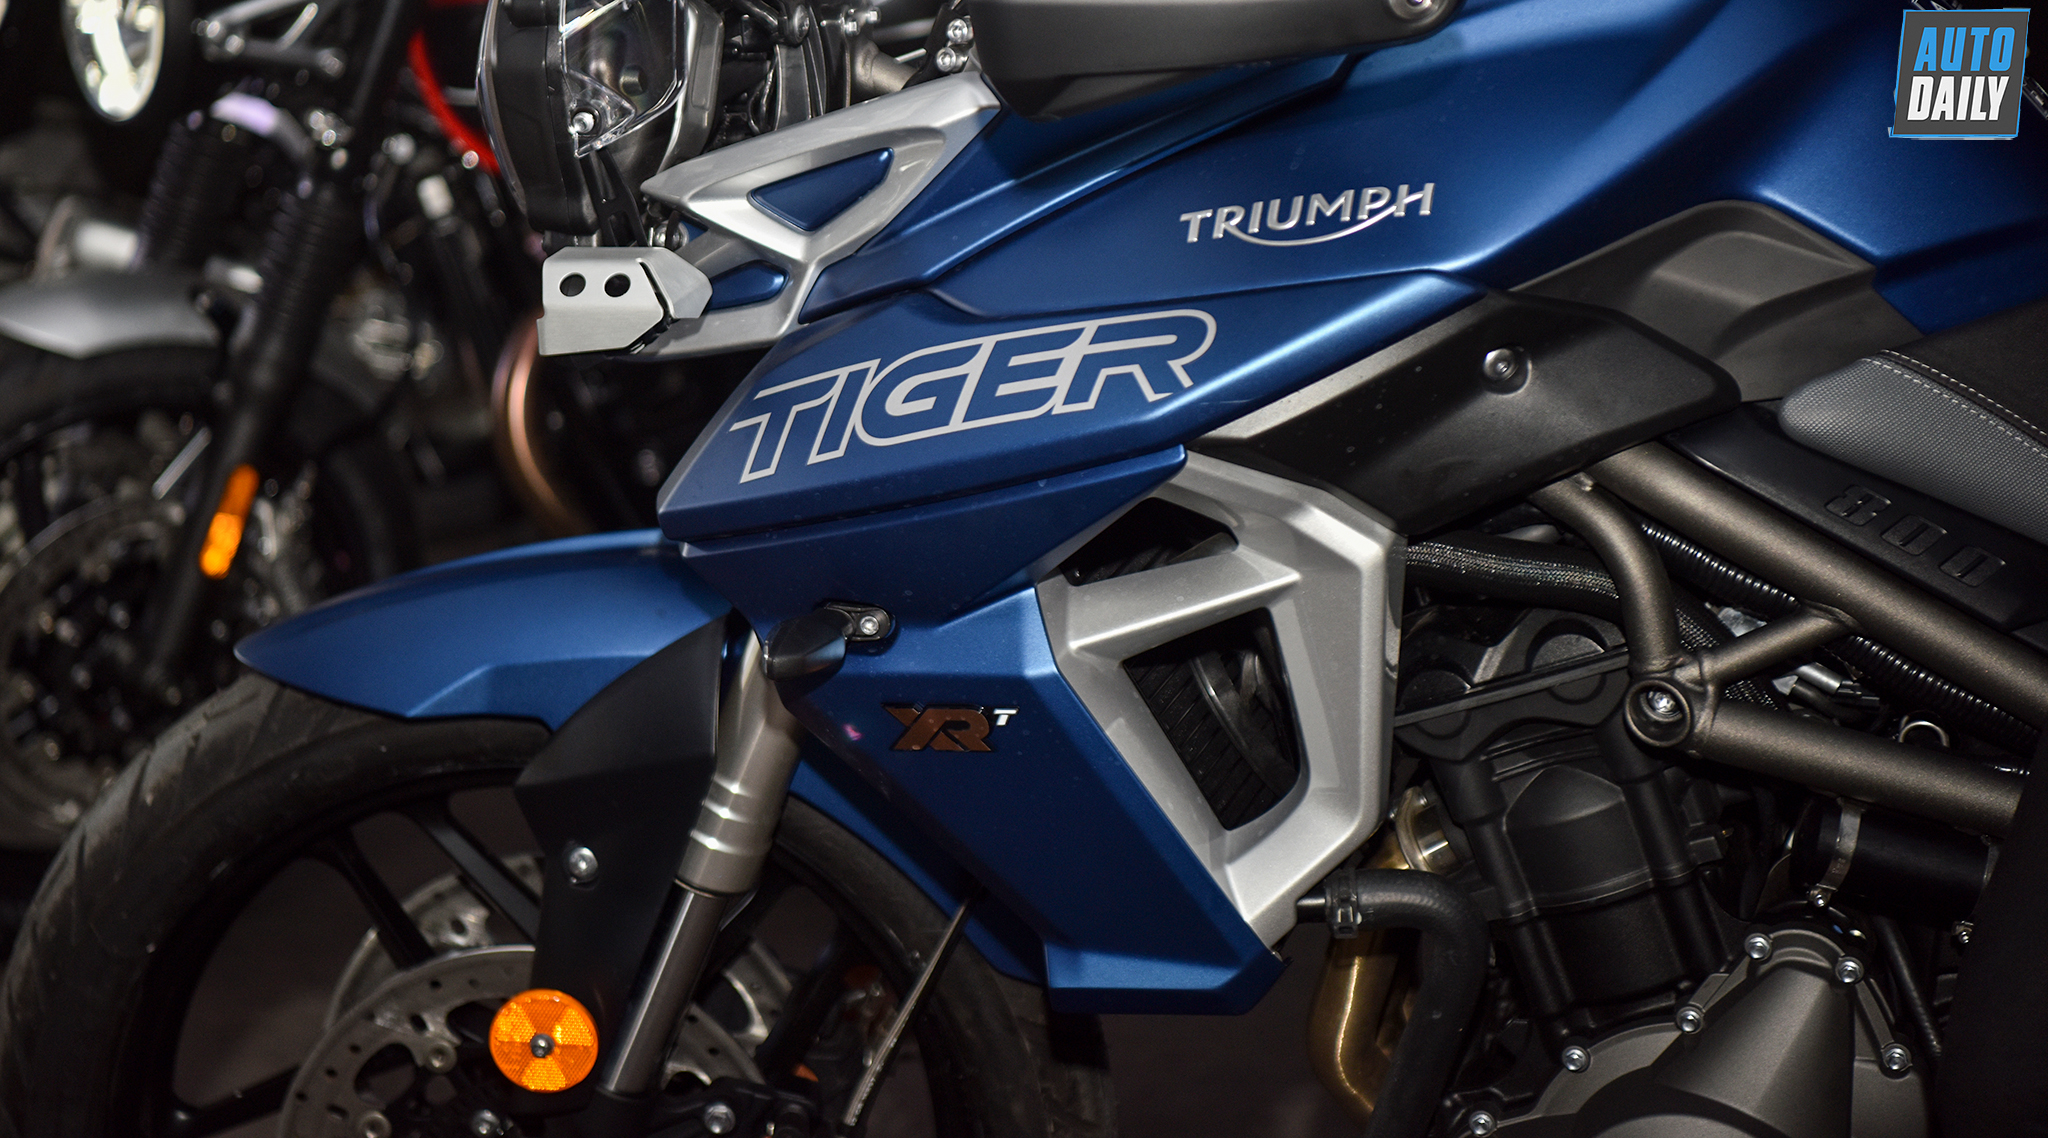 triumph-tiger-800-2019-1.jpg